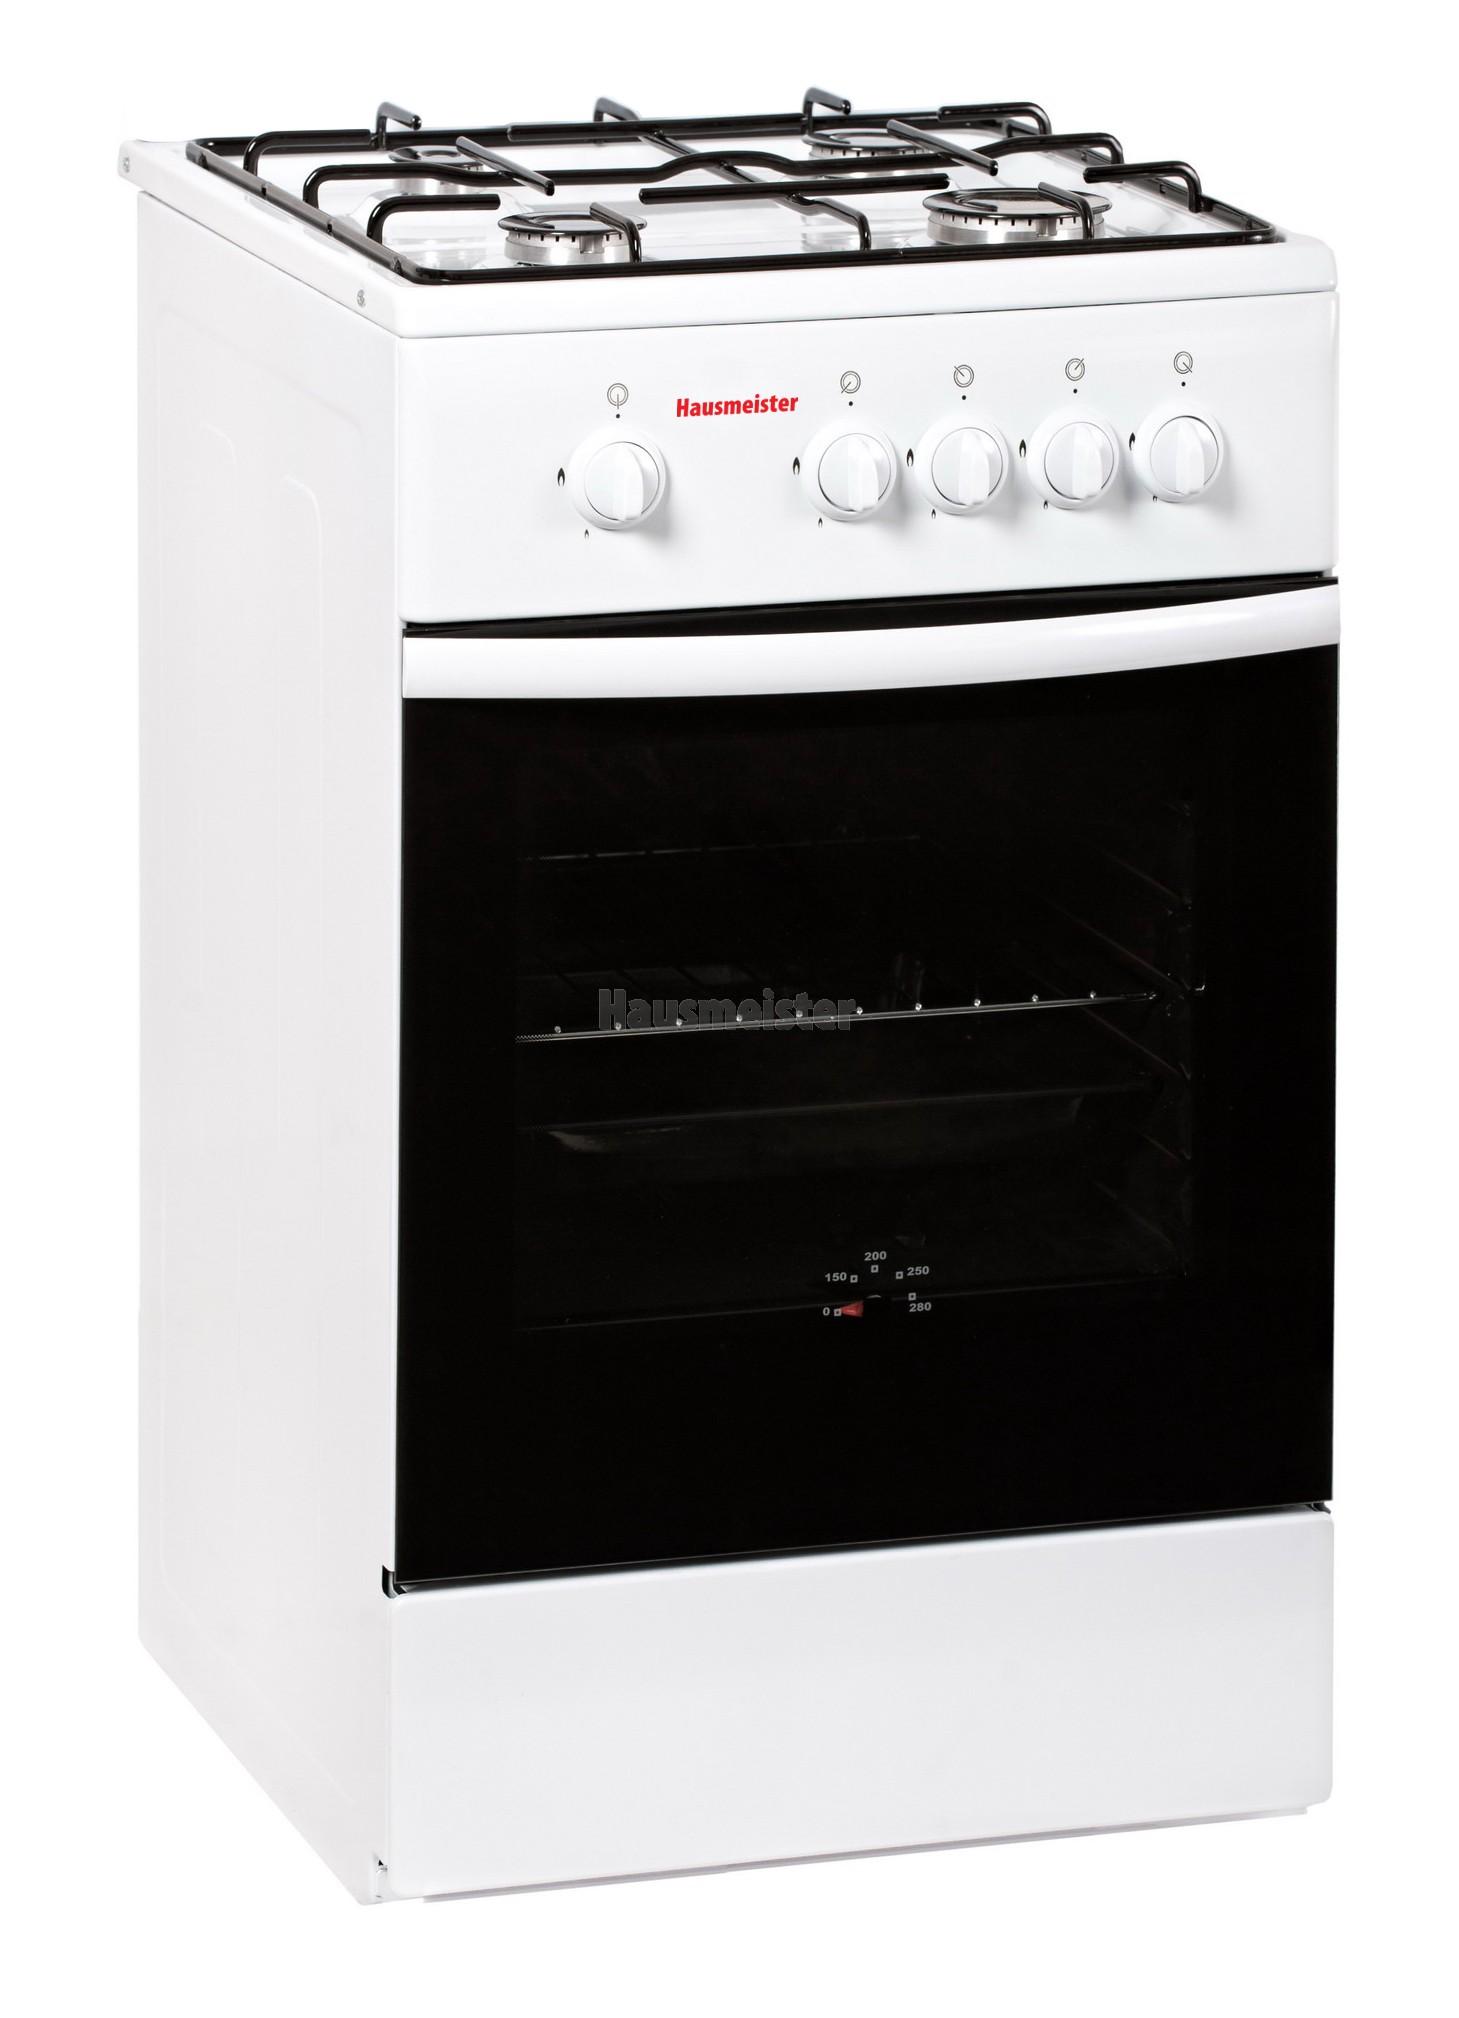 Hausmeister HM5005 tűzhely